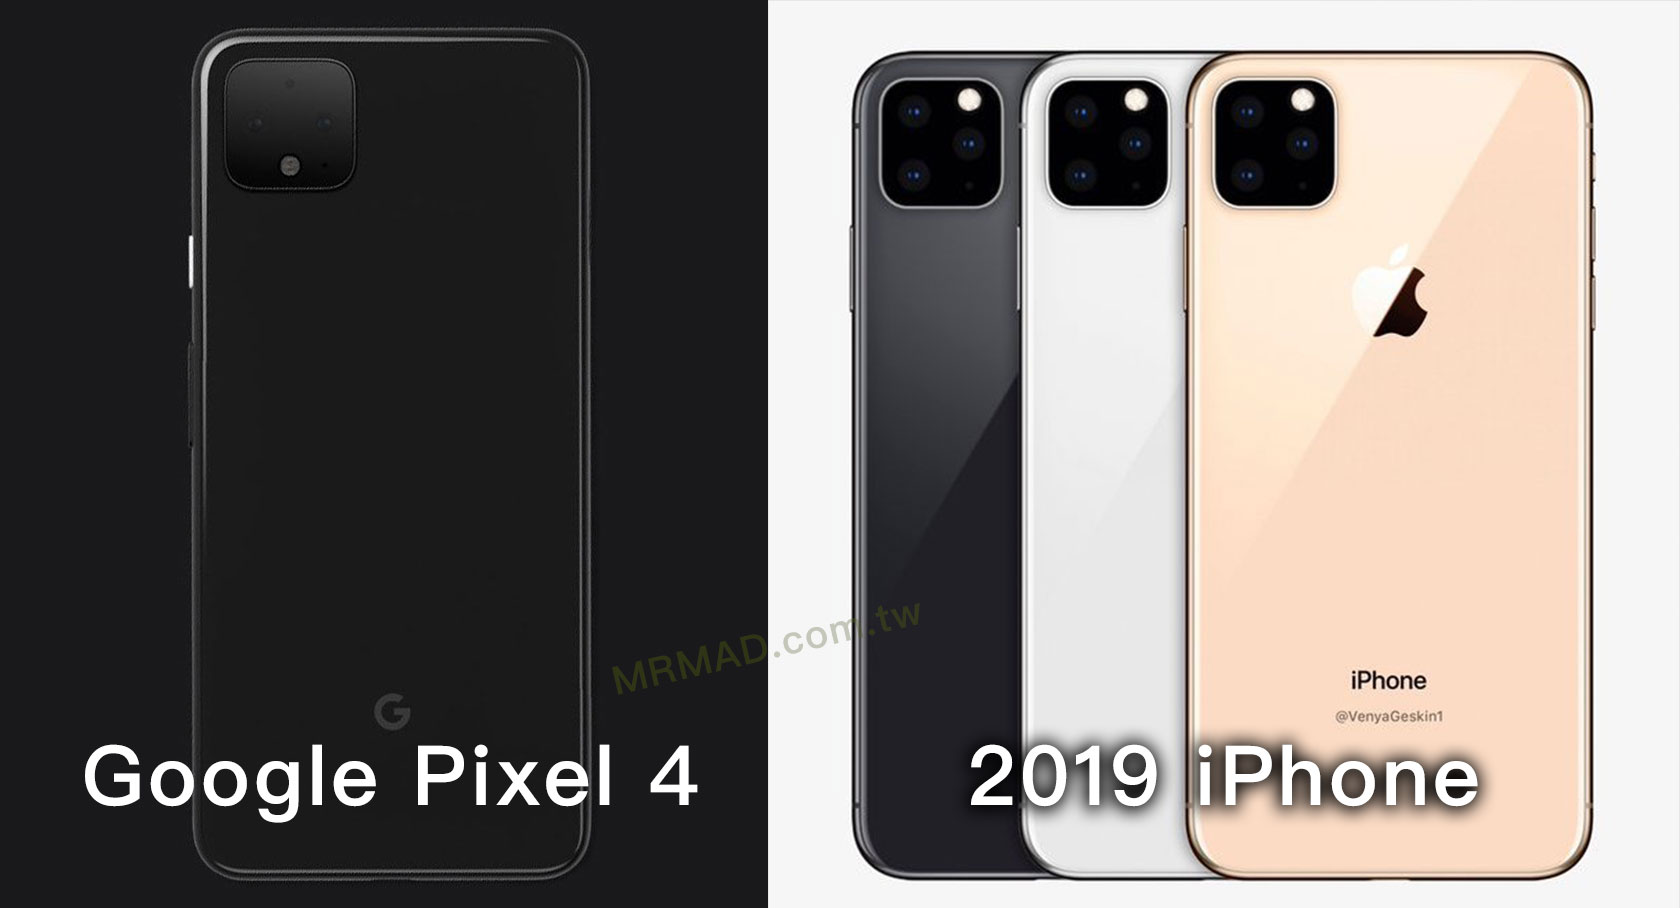 Google 自爆 Pixel 4 鏡頭設計圖,跟 2019 年款 iPhone 外型雷同4